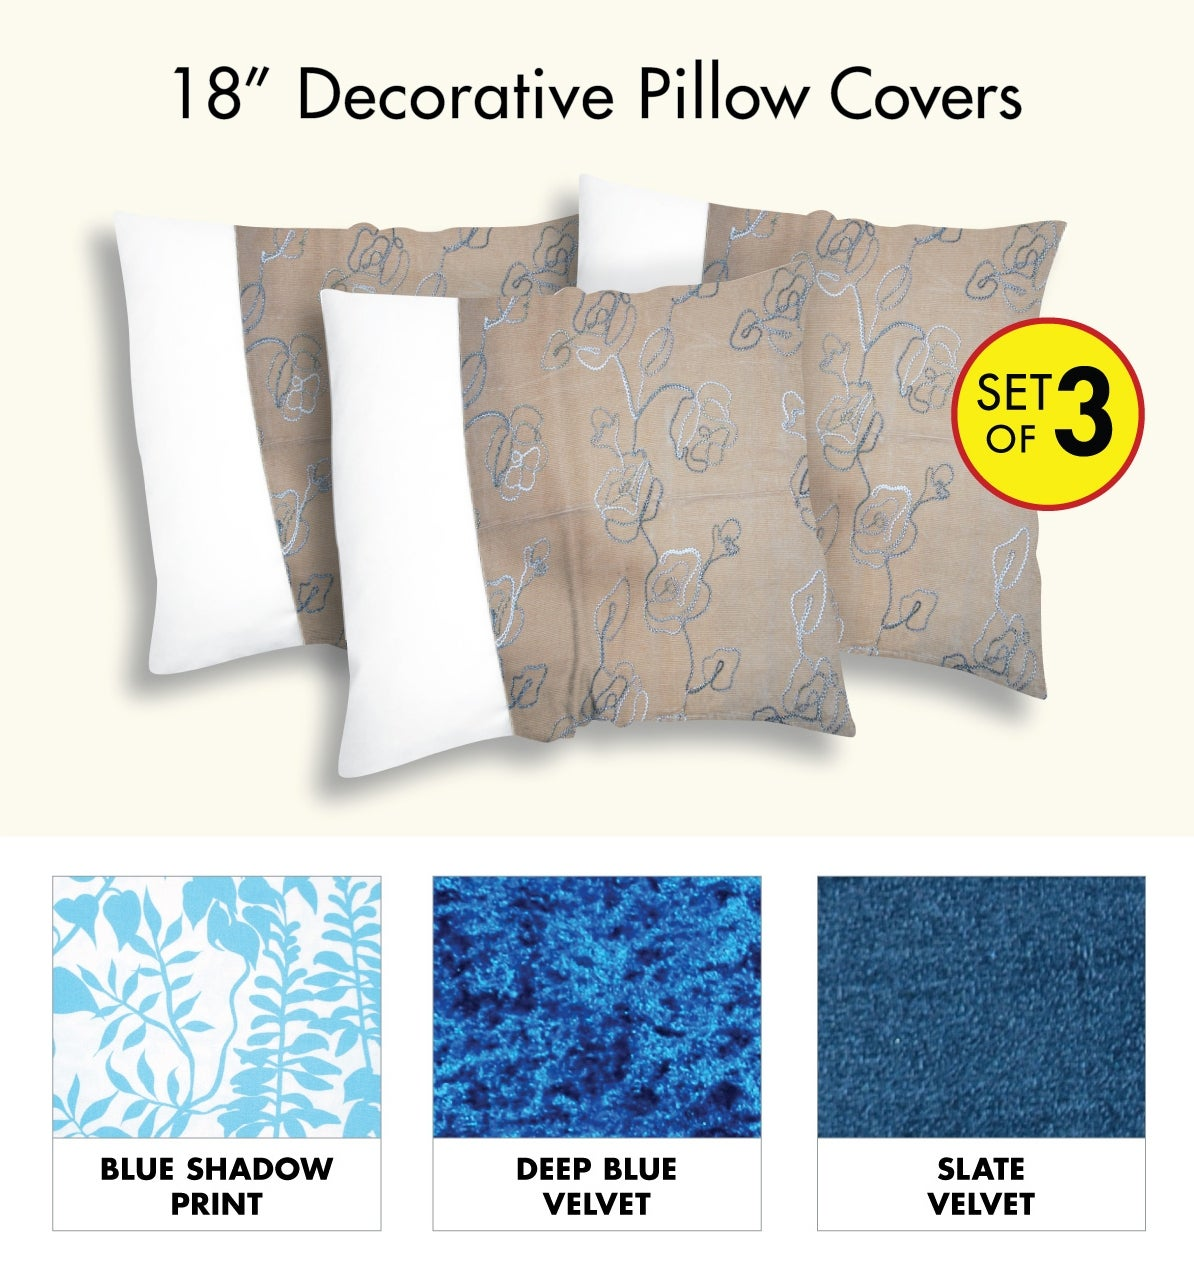 Decorative Multicolored Pillow Cover (Set of 3)